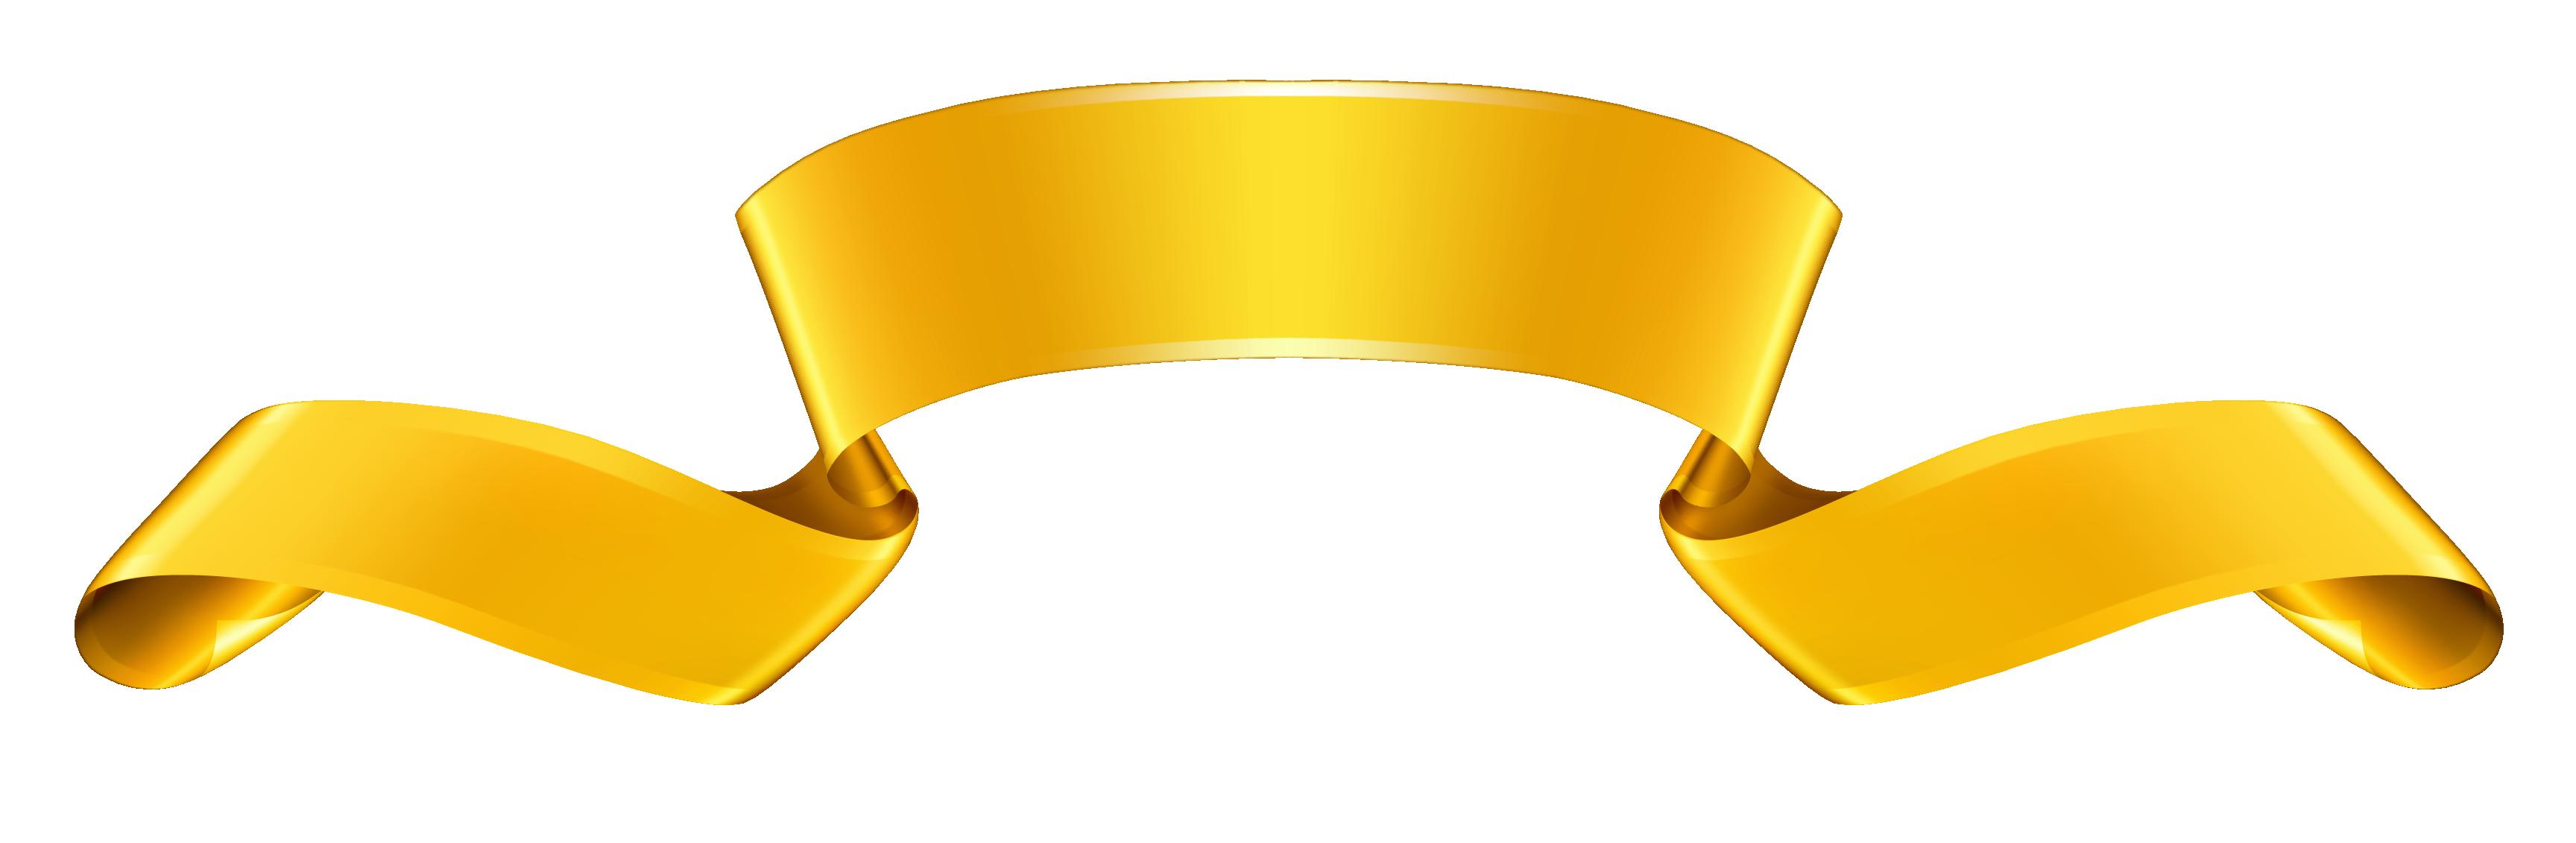 3456x1131 Gold Banner Clipart